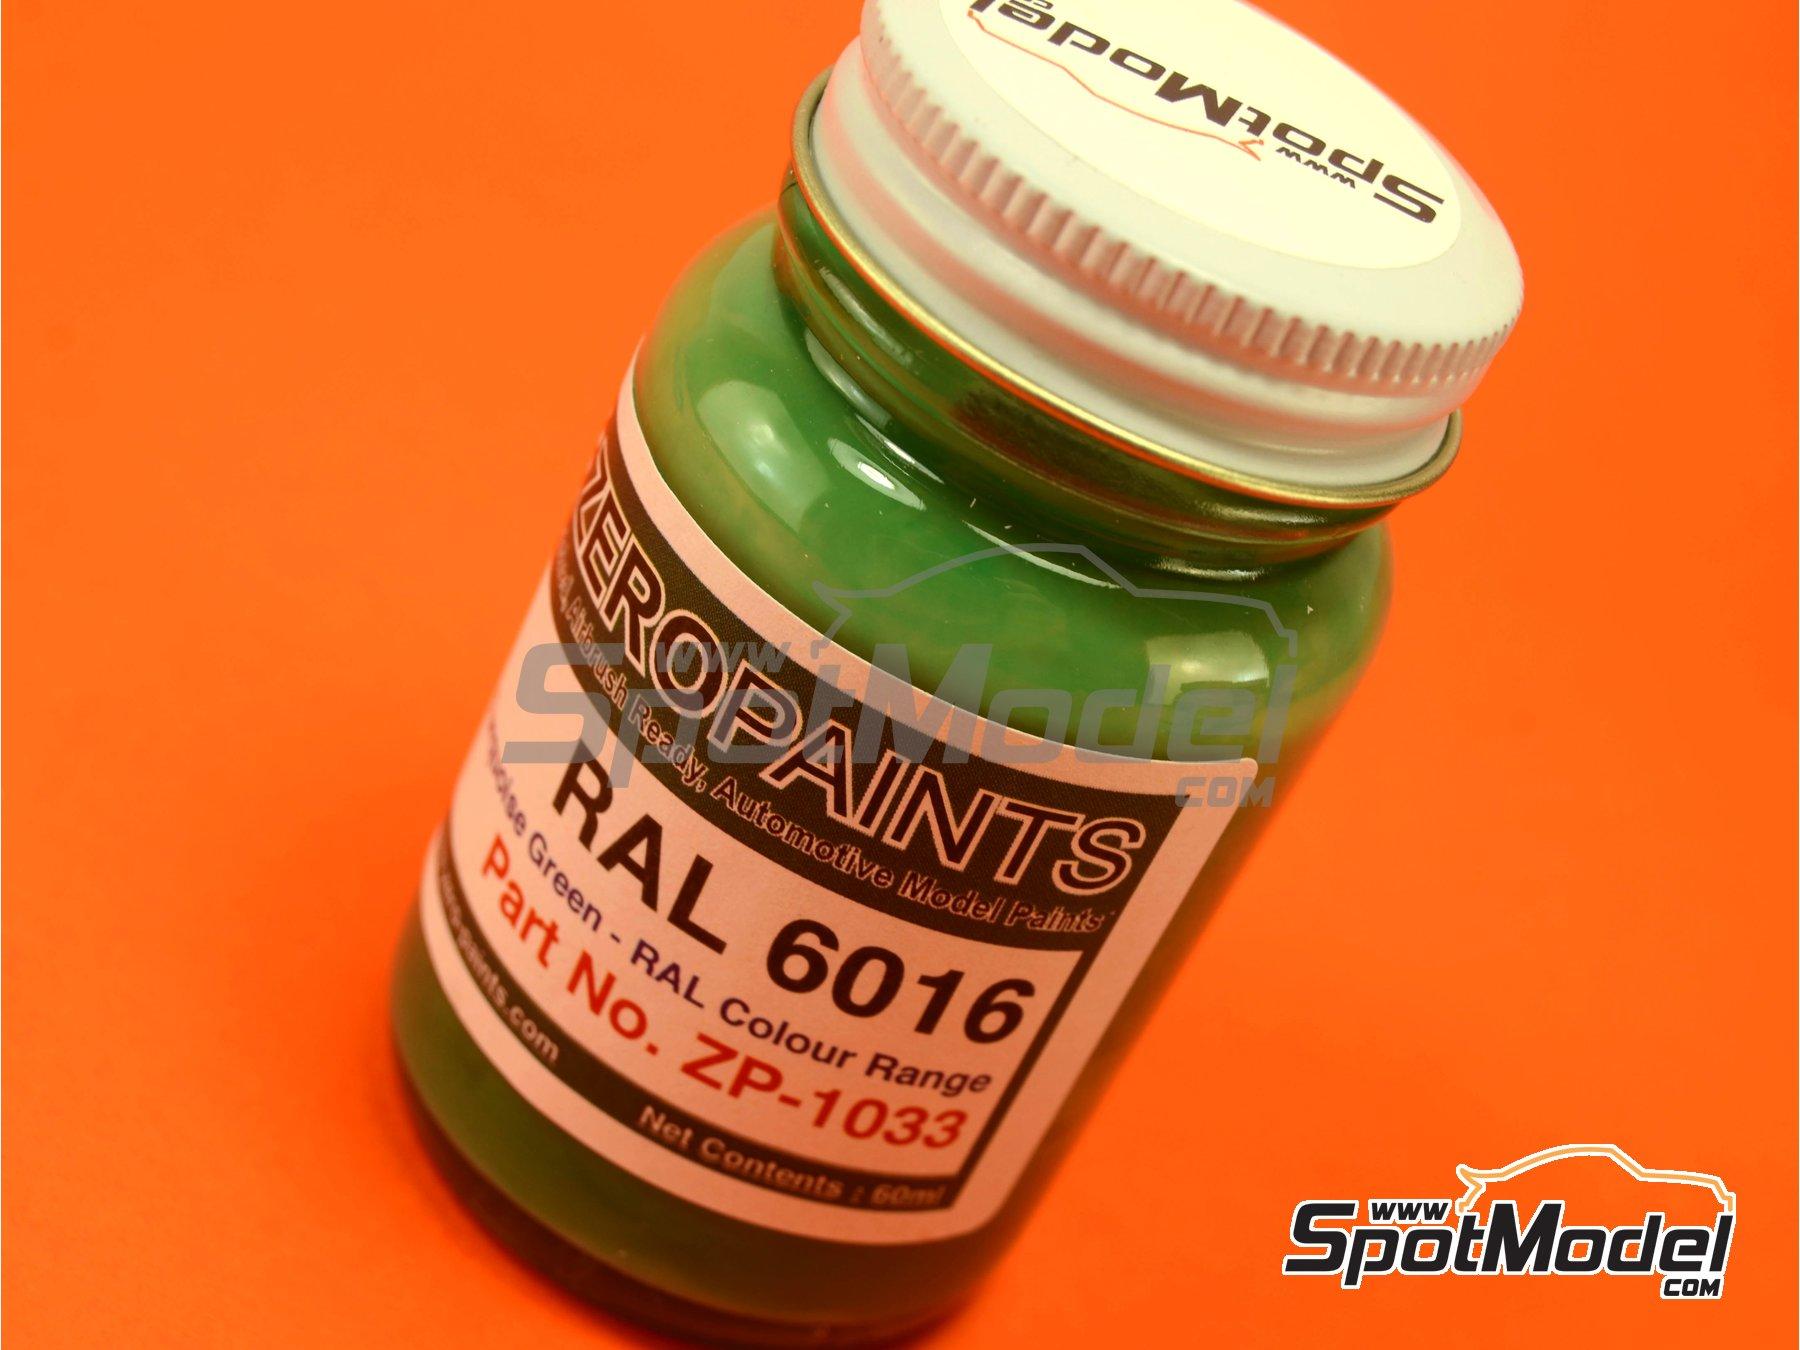 Image 1: Verde turquesa - RAL6016 - Turquoise green - 1 x 60ml | Pintura fabricado por Zero Paints (ref.ZP-1033-RAL6016)